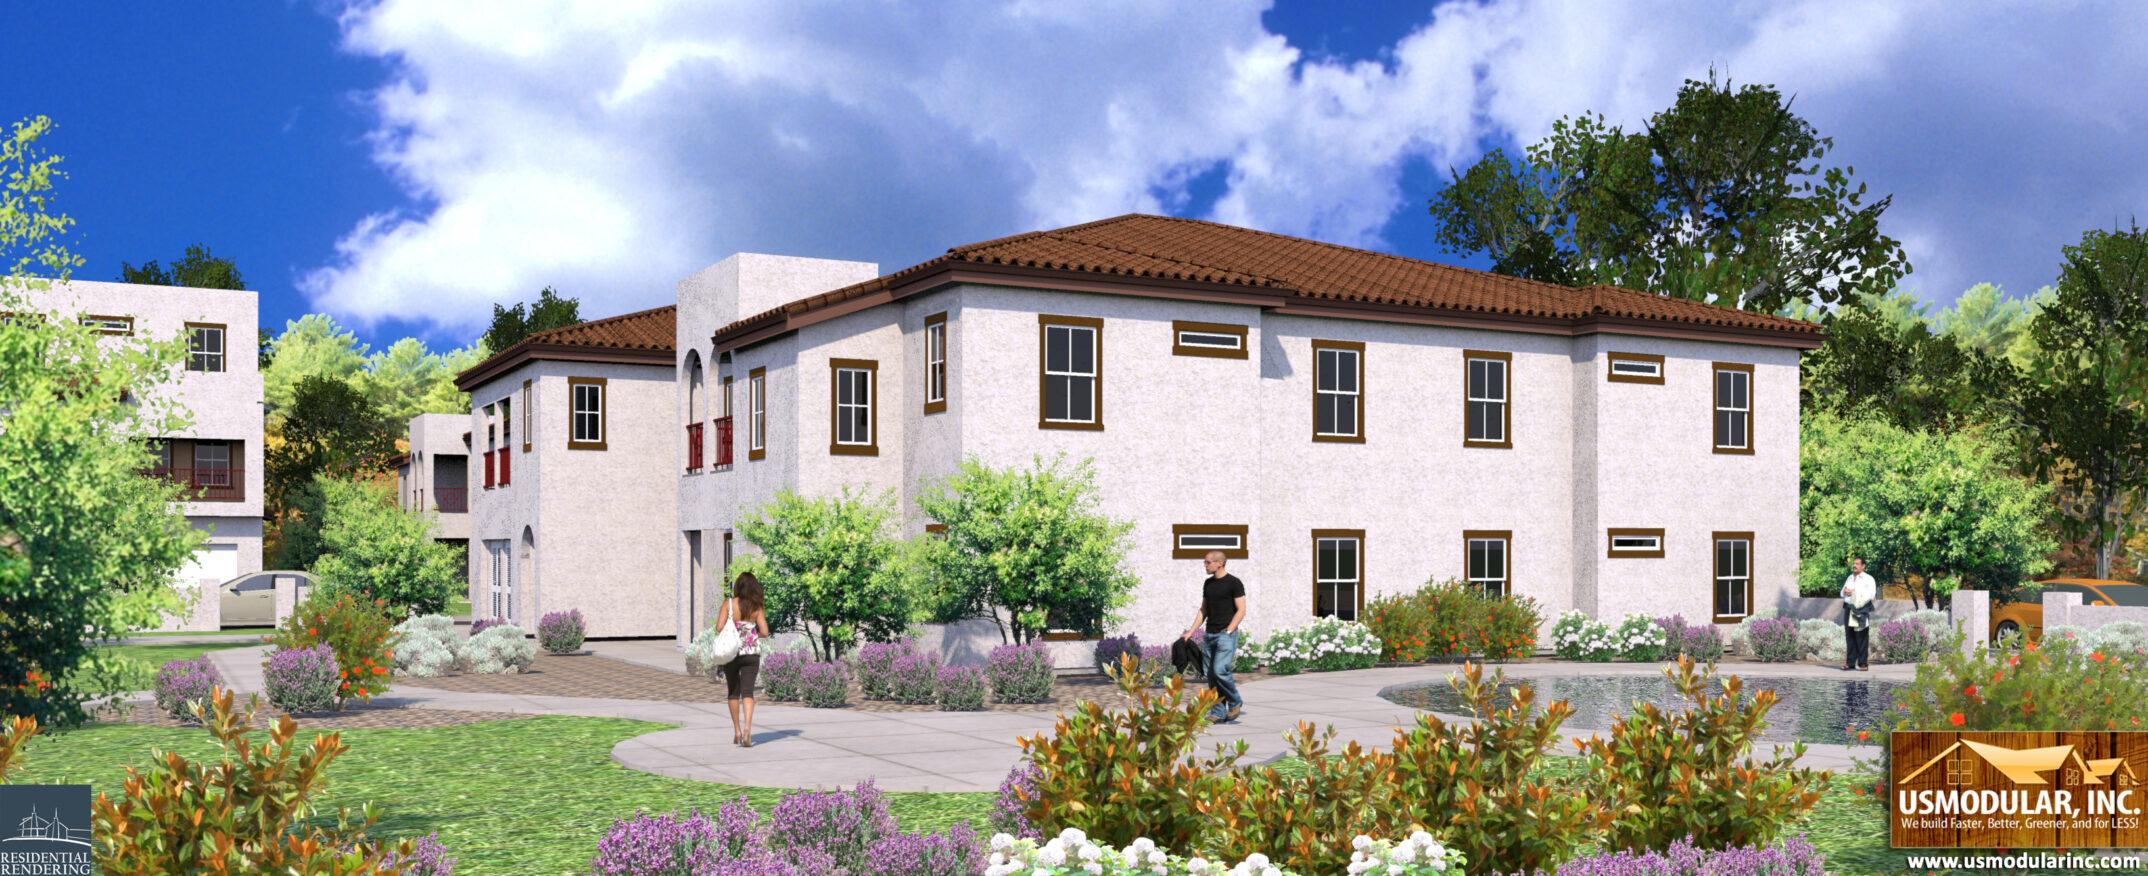 San Bernardino County Favors Modular Construction For Upcoming Affordable Senior Living Project